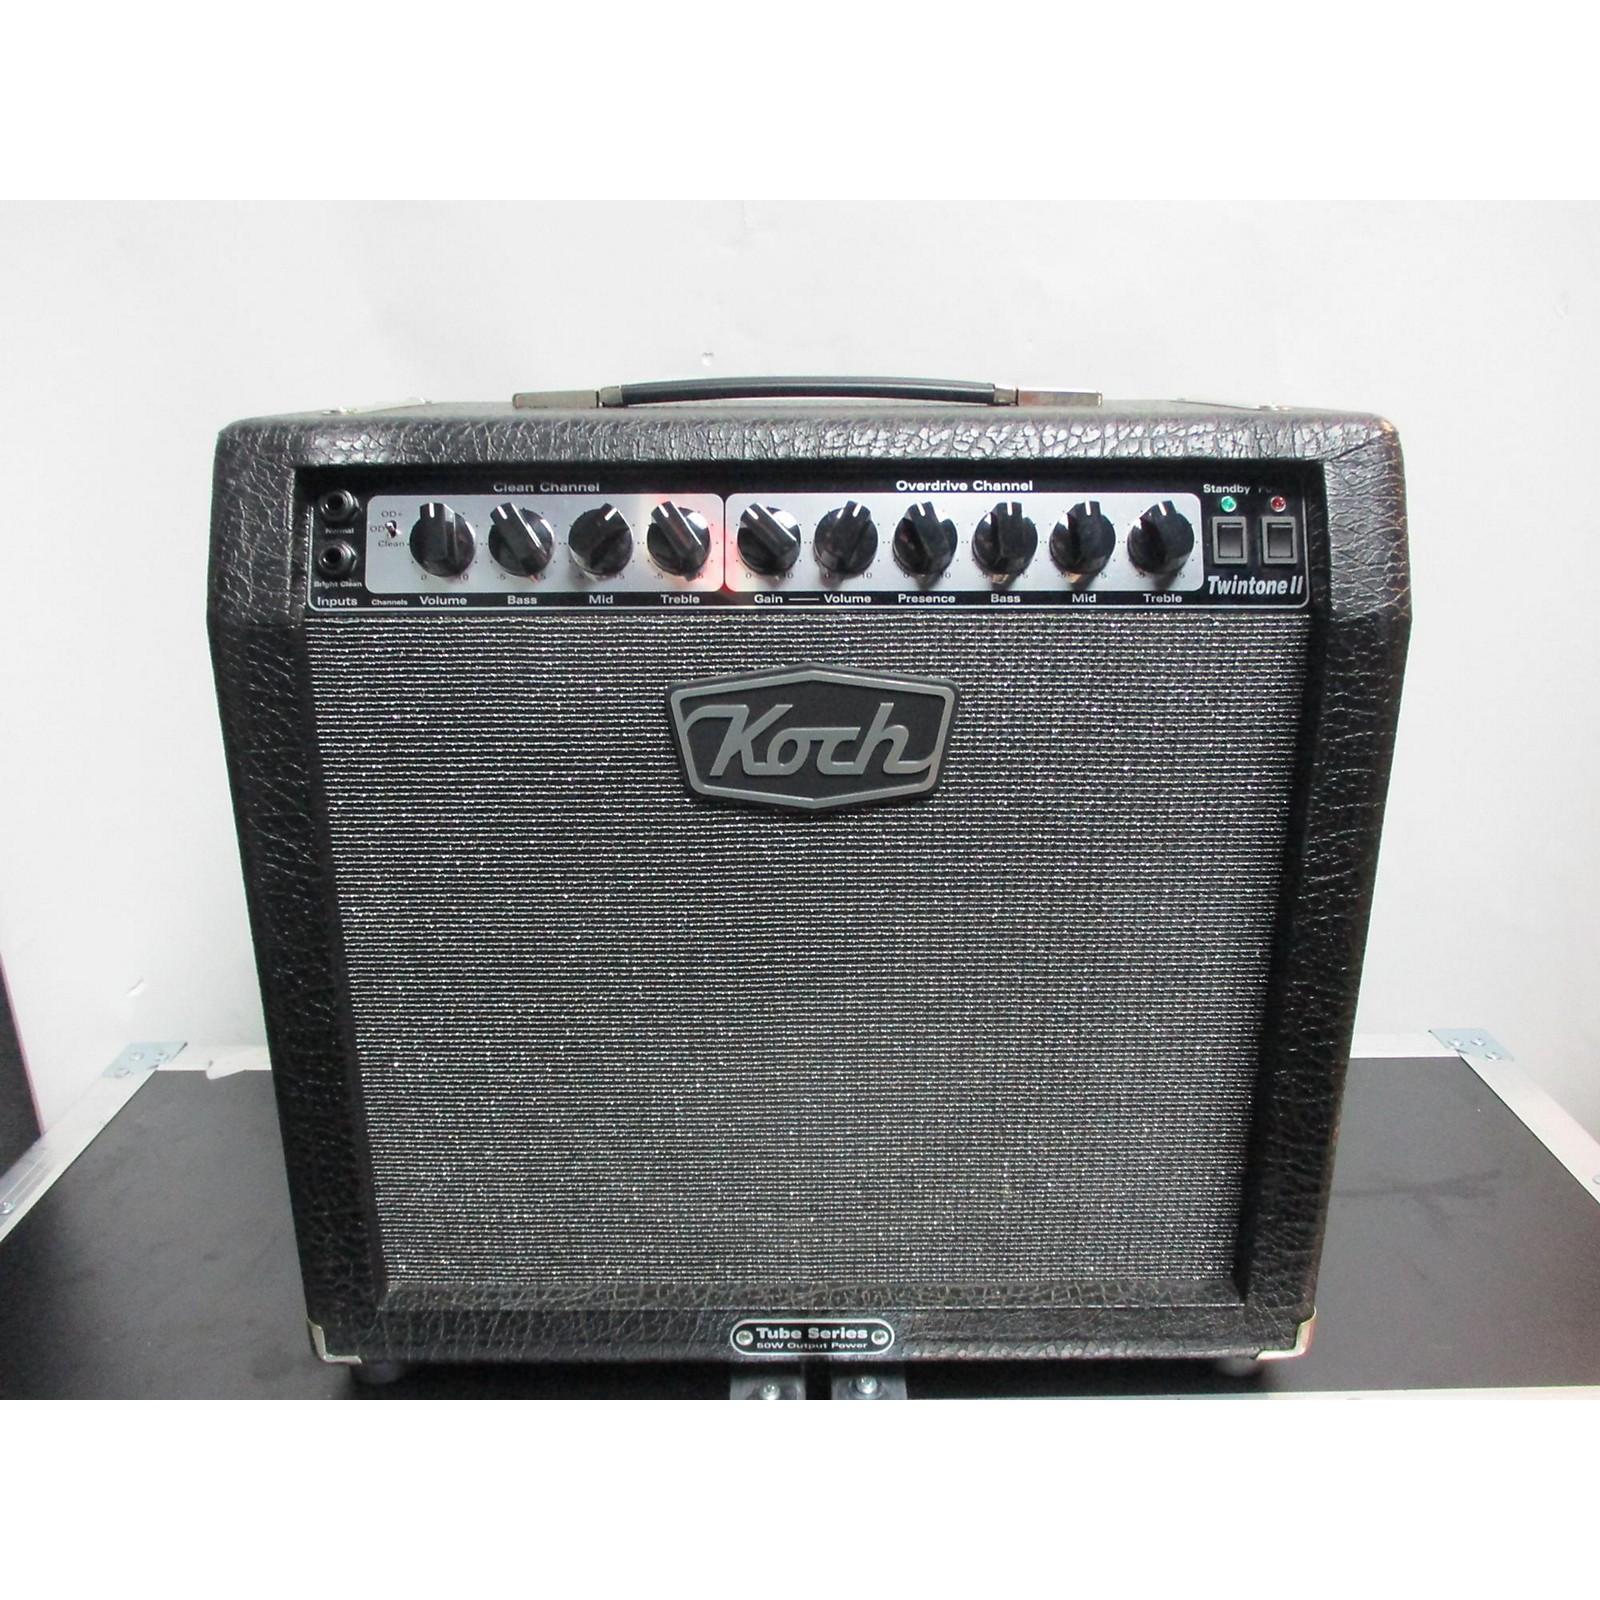 Koch Twintone II 1X12 50W Tube Guitar Combo Amp